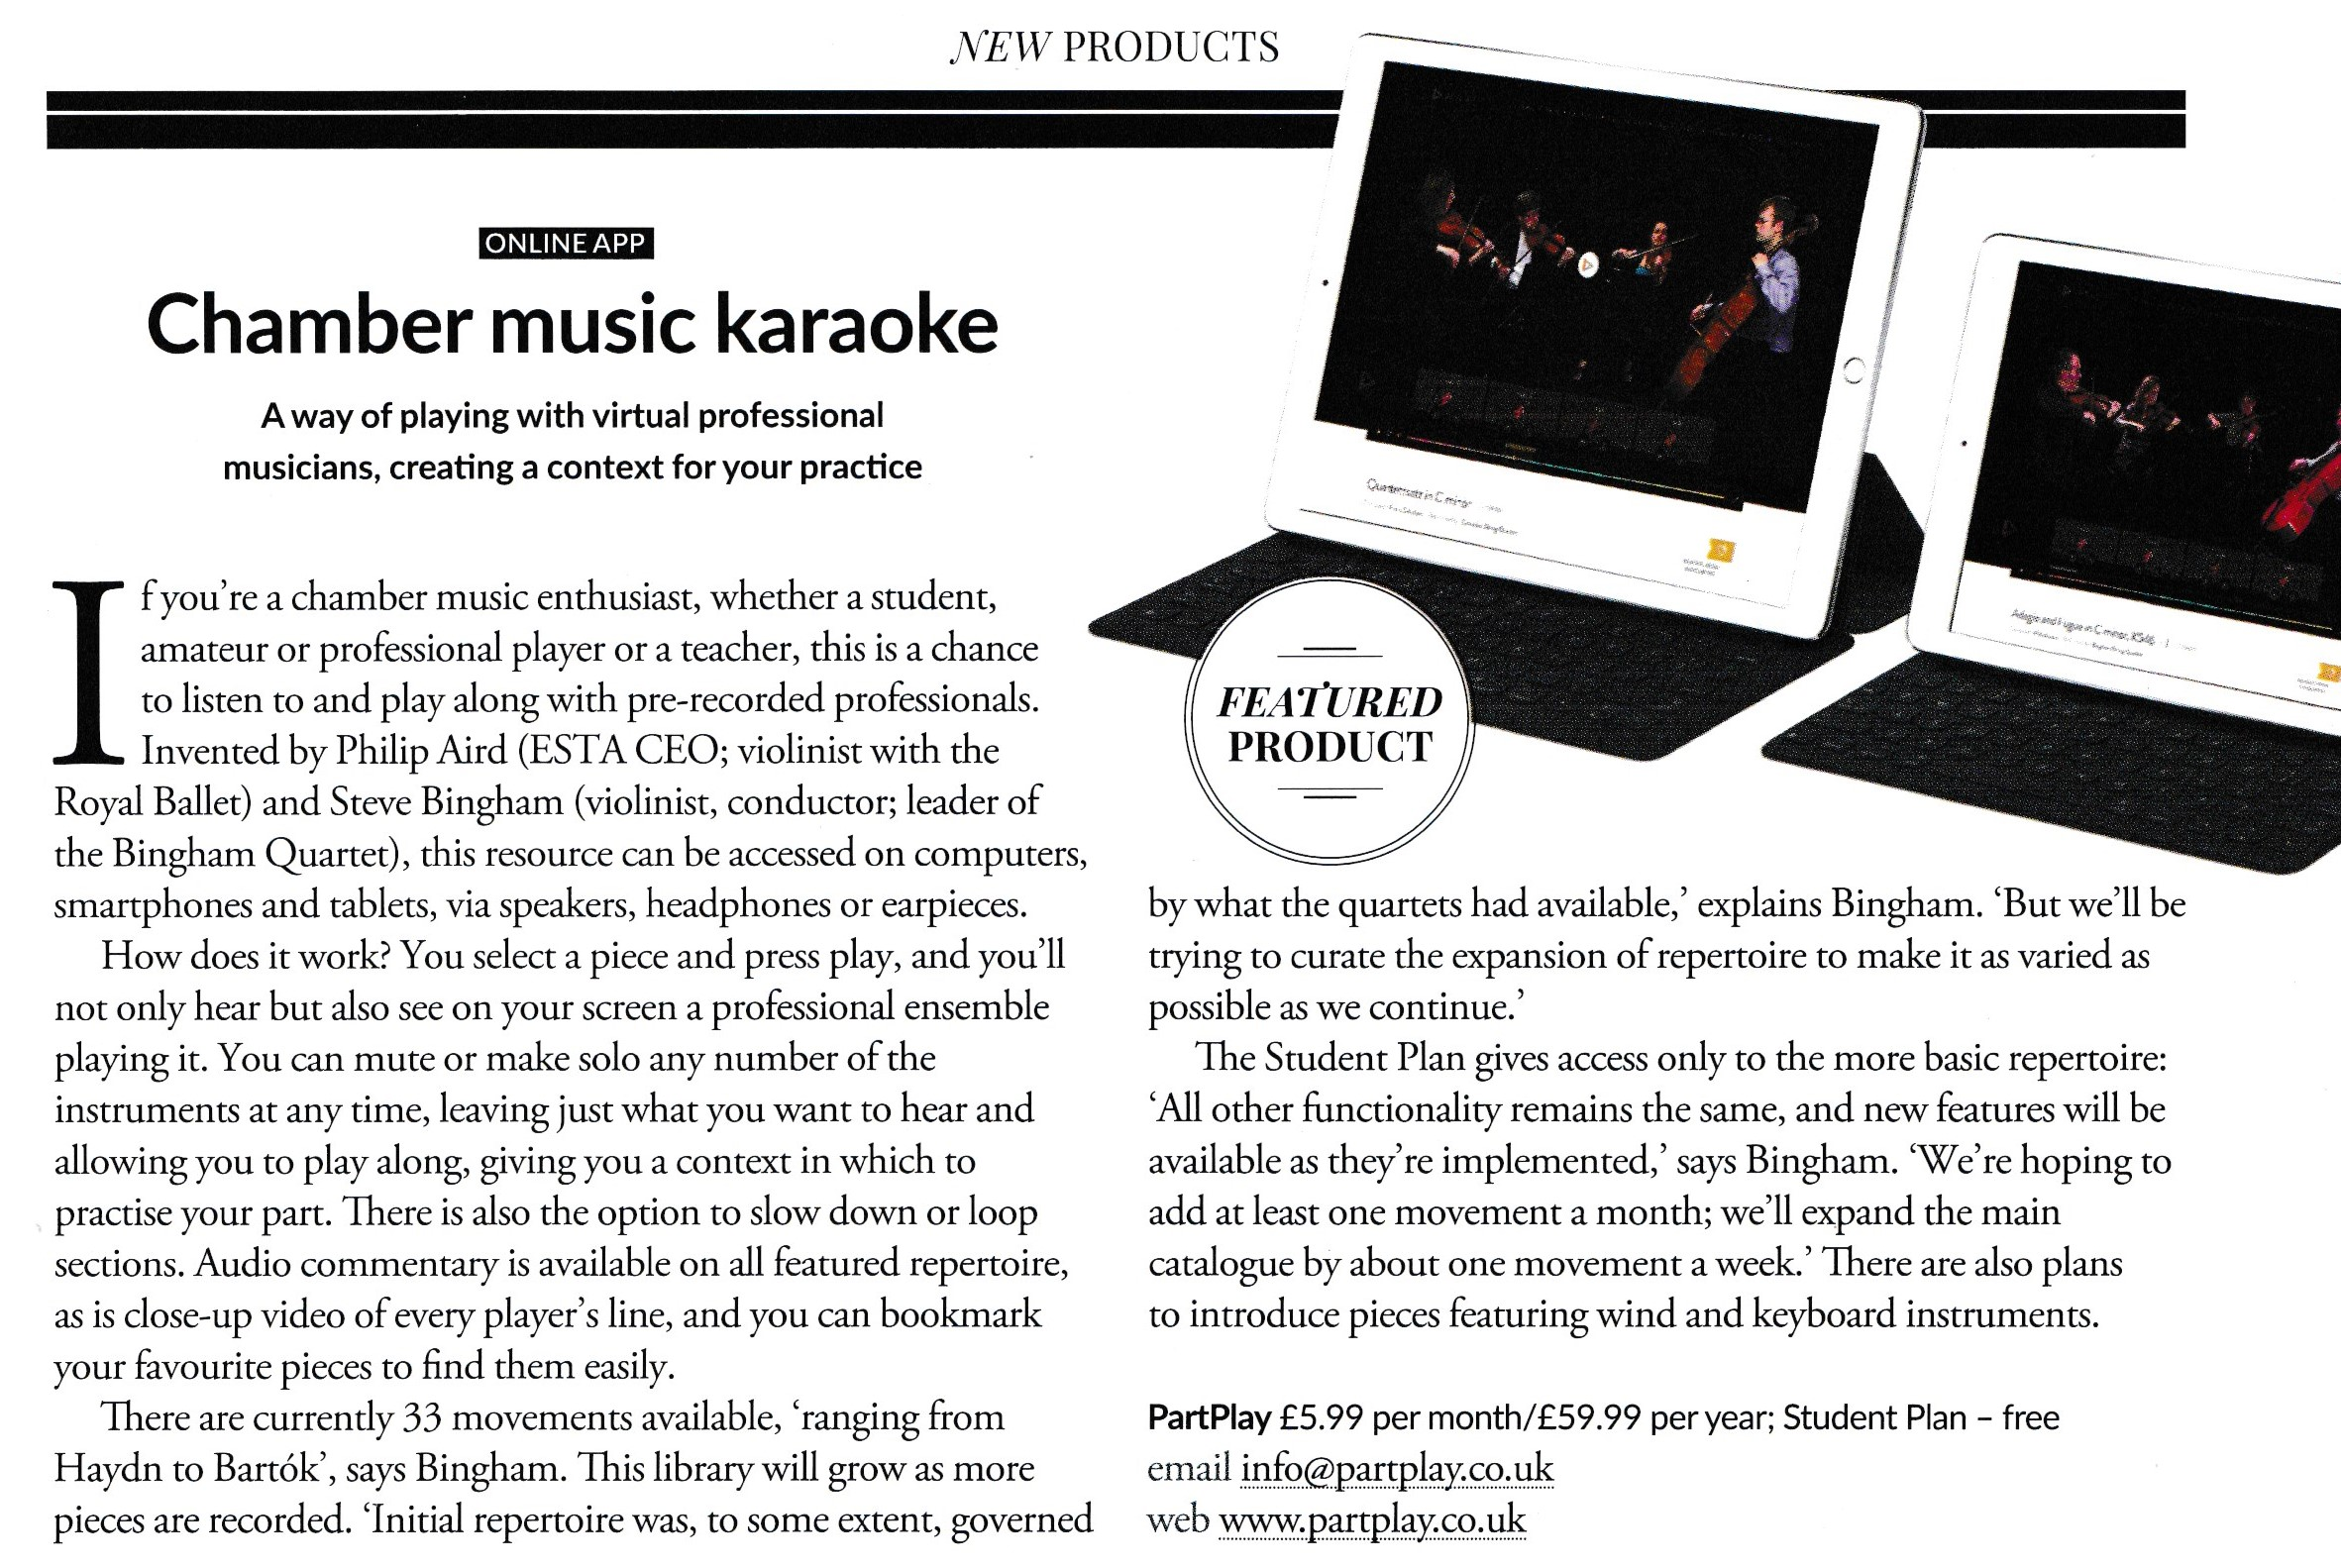 Kamermuziek karaoke, Strad 2016.08, p. 23